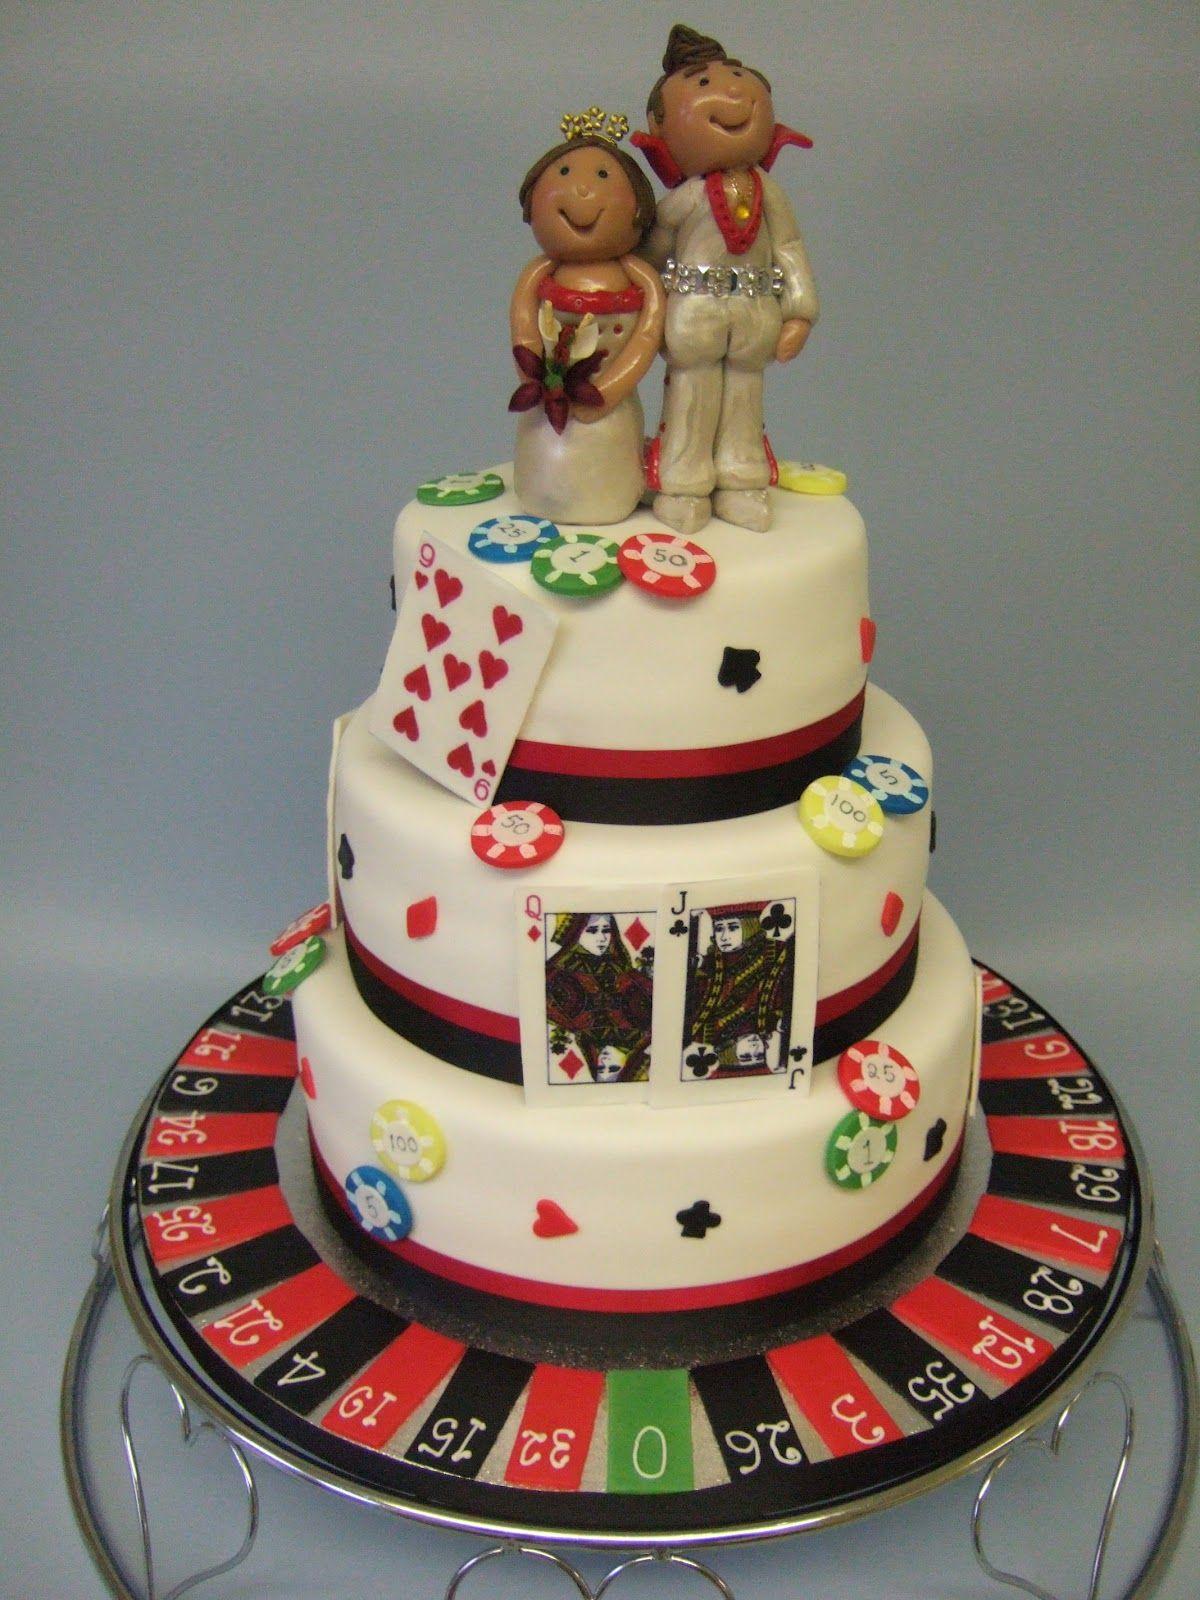 Exciting fun and unique las vegas wedding cake theme